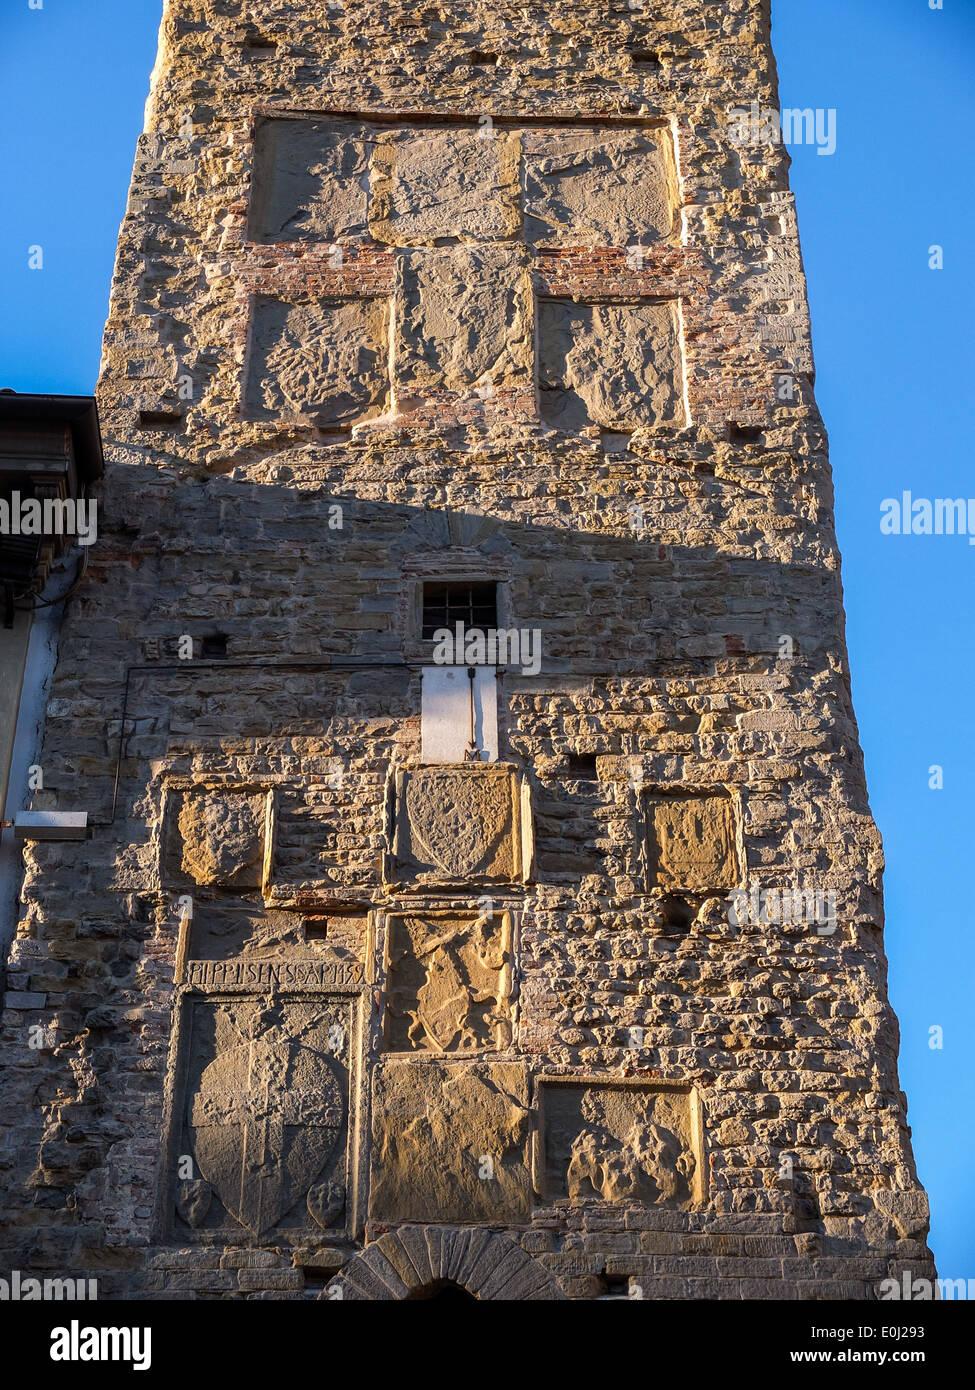 Città di Castello, Umbria, Italy: Torre Civica detail; coats of arms - Stock Image